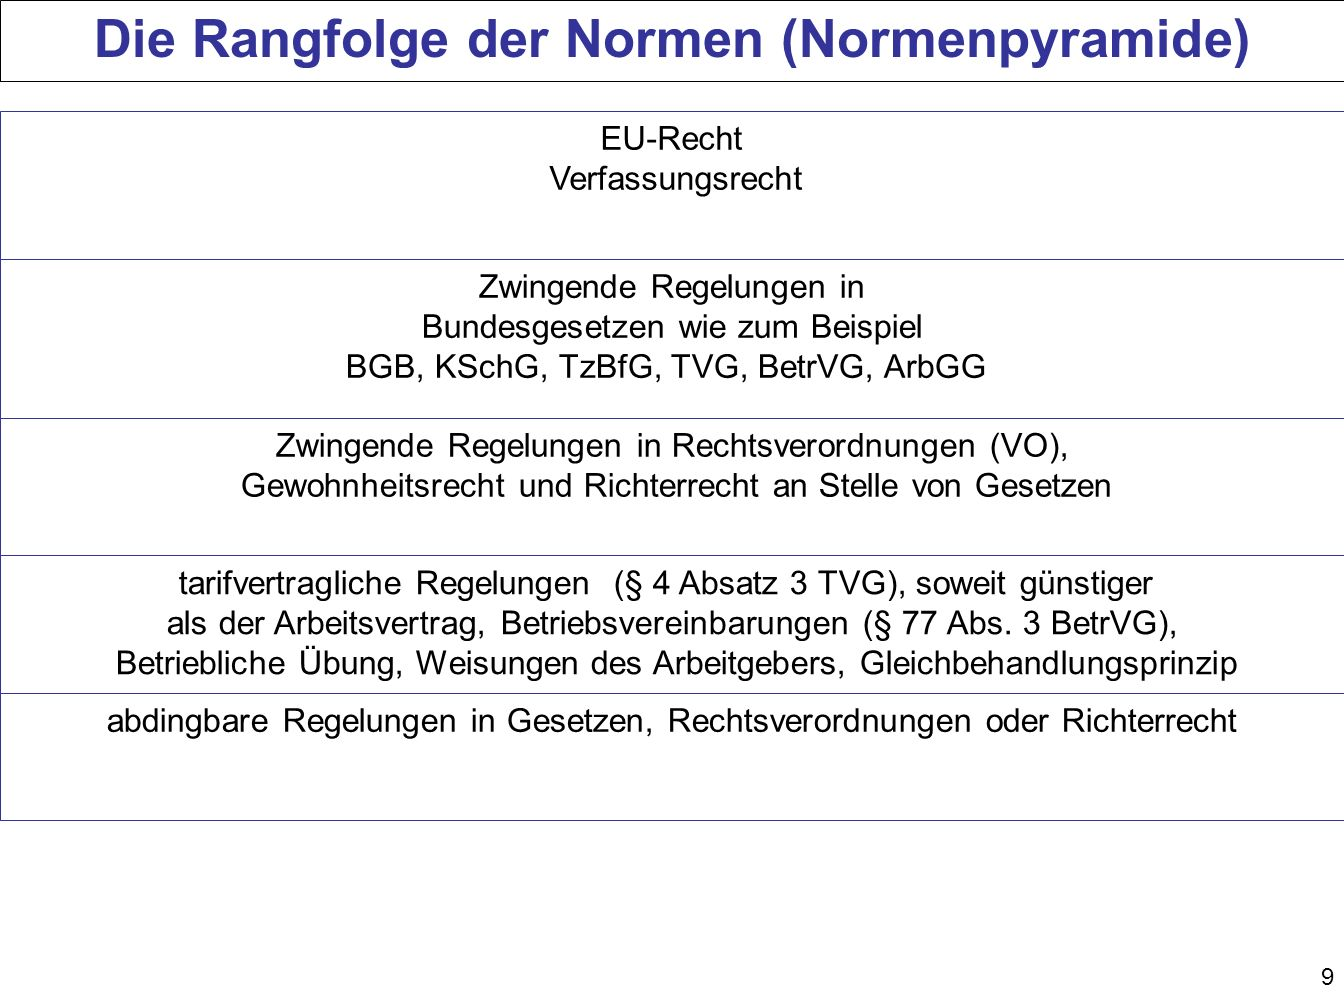 Die Rangfolge der Normen (Normenpyramide)